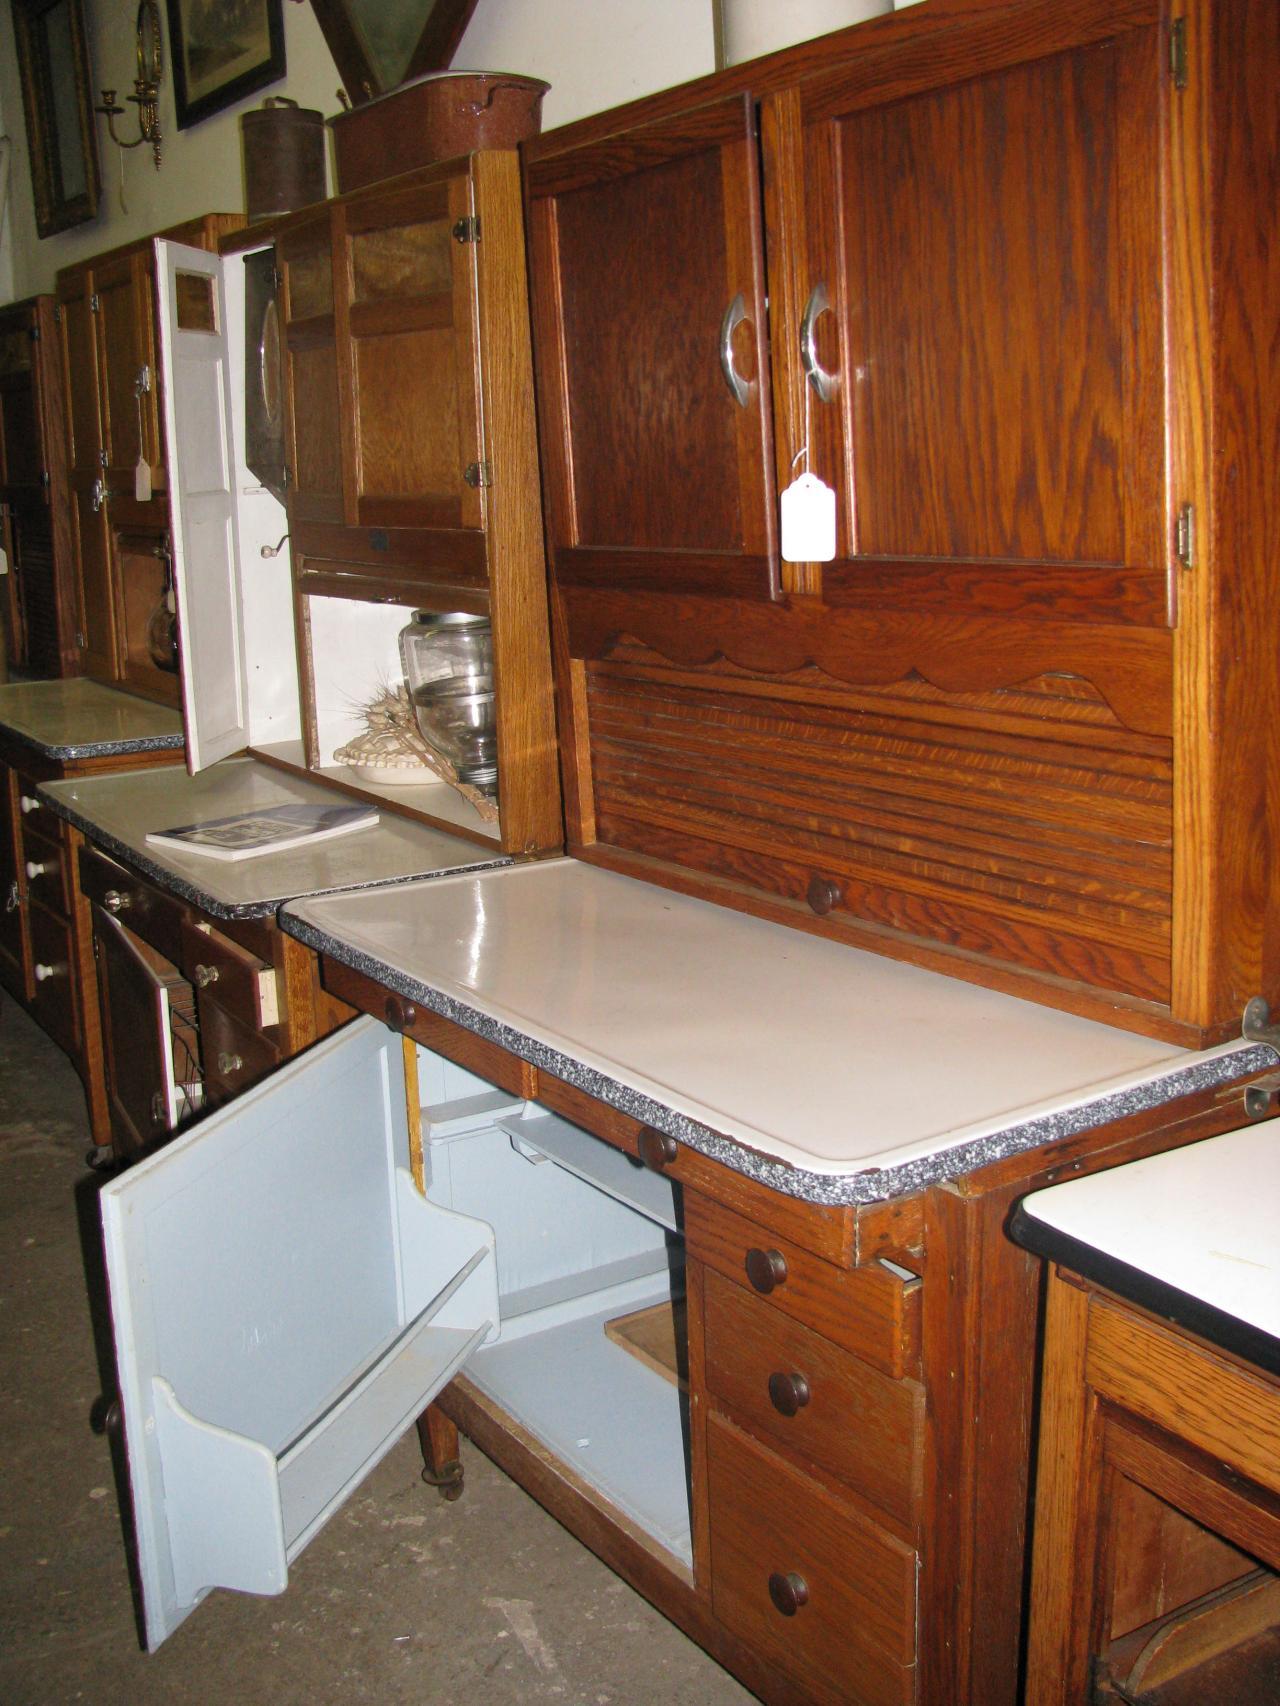 Z S Antiques Restorations Hoosier Baker Cabinets Including